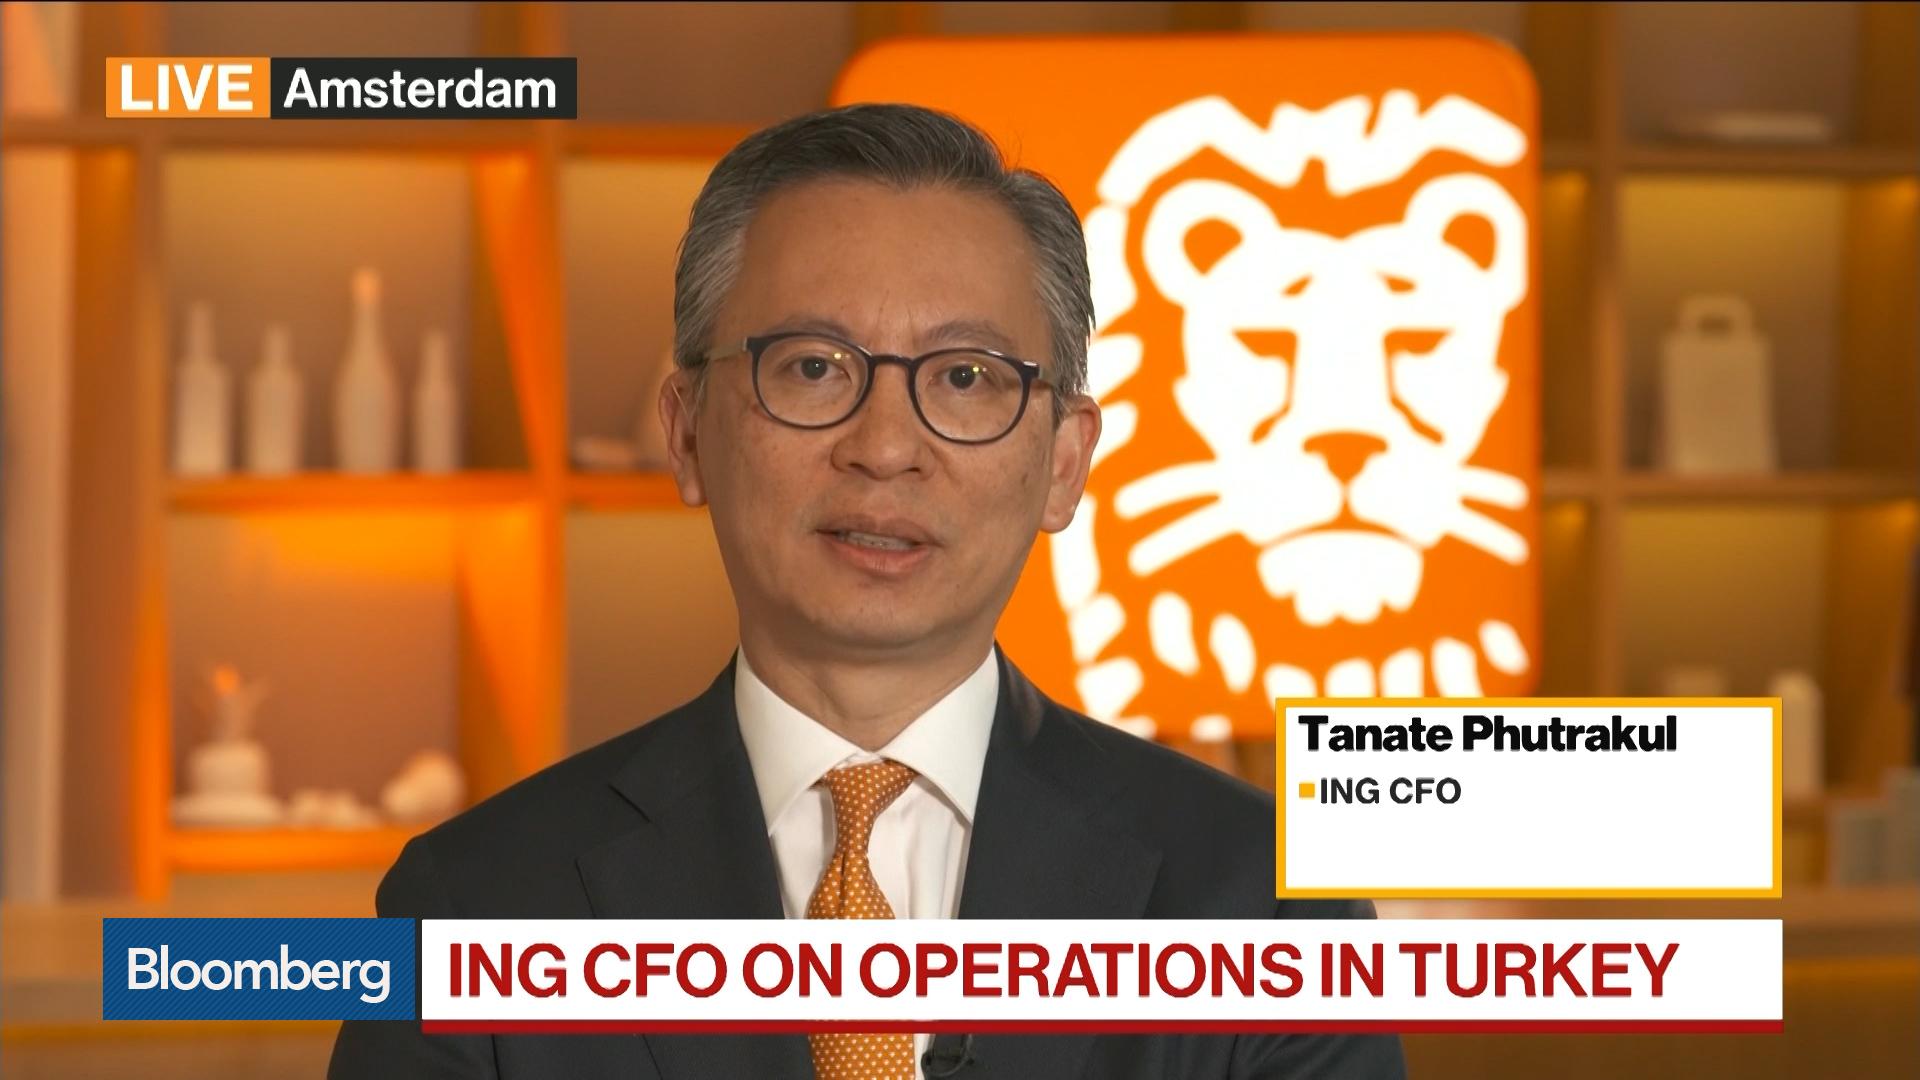 ING CFO on 2Q Earnings, M&A, Turkey, Money Laundering